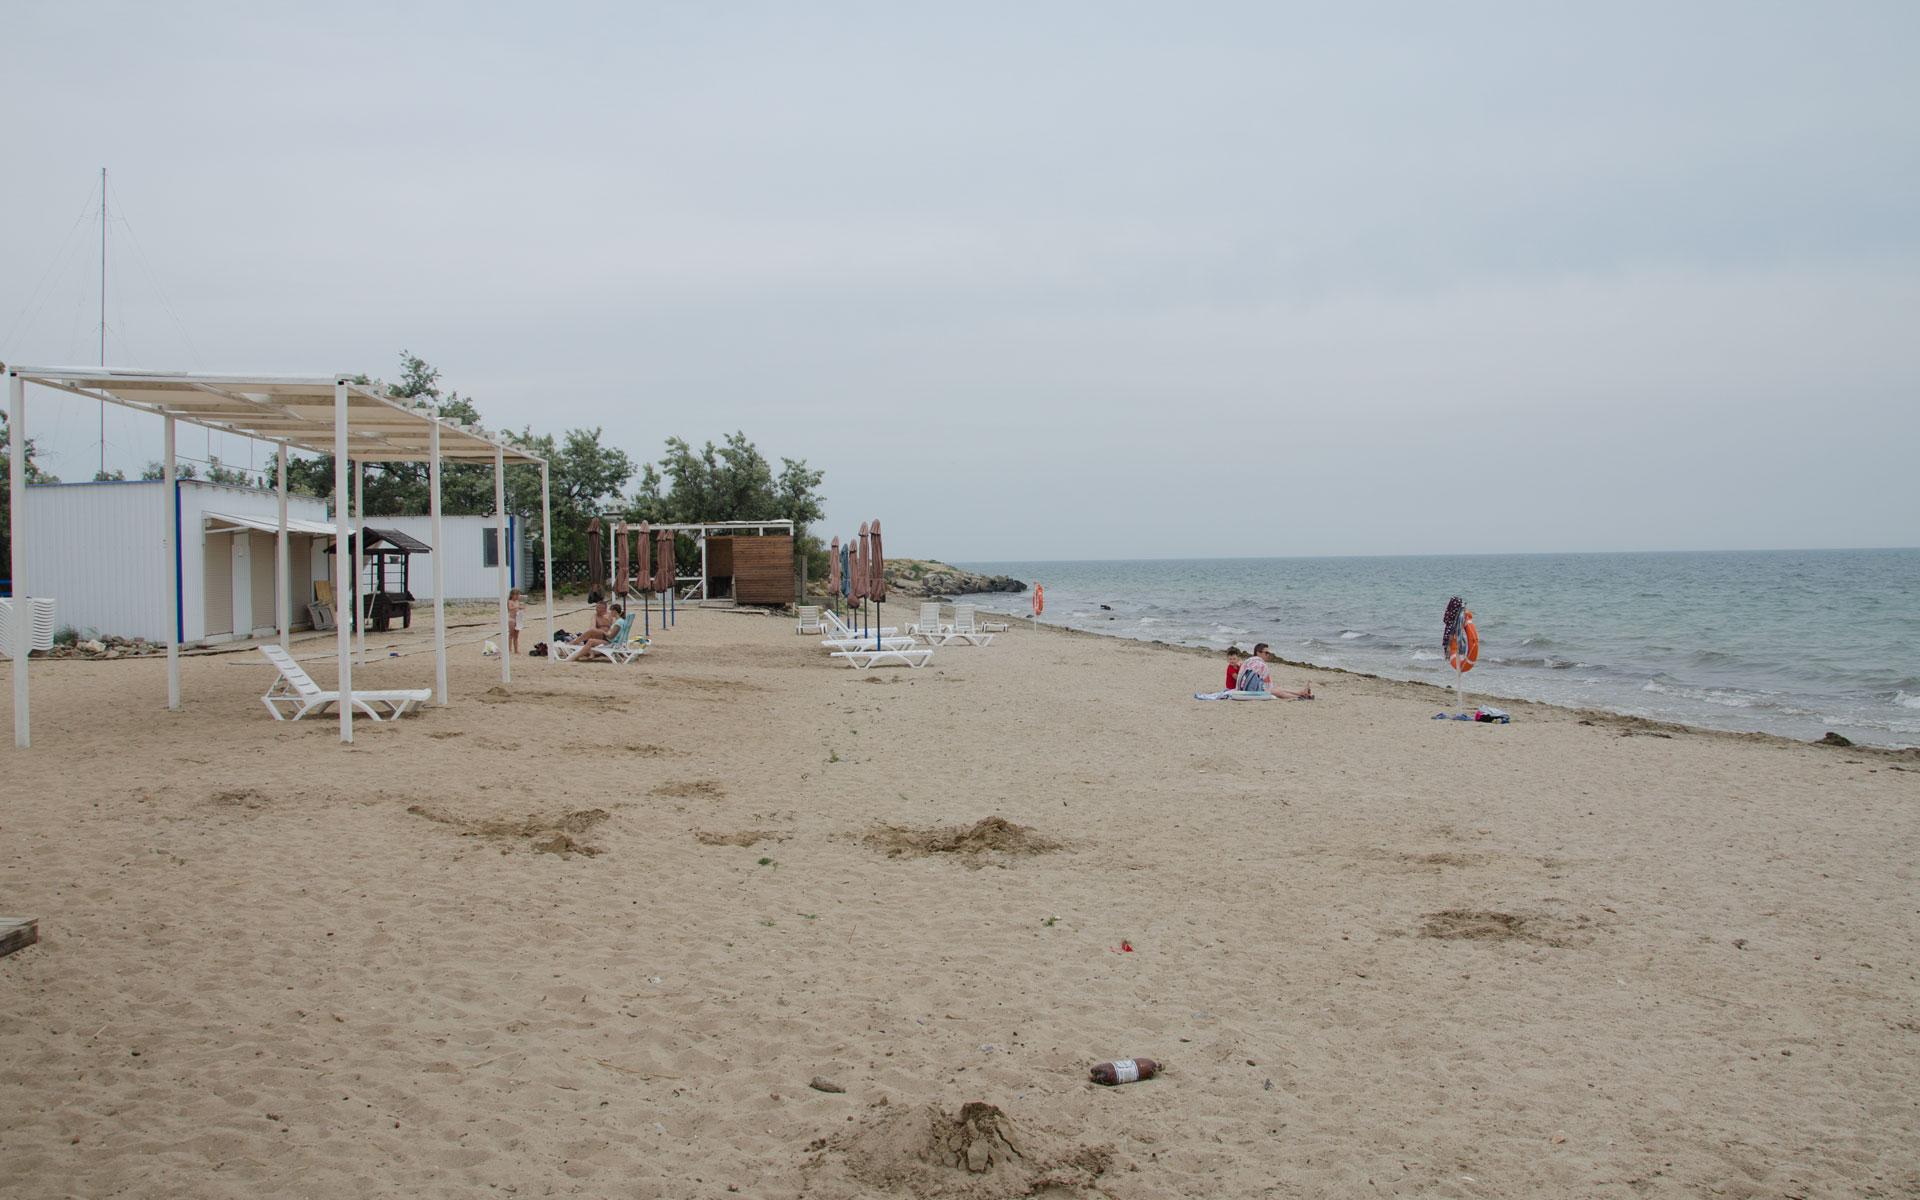 Пляж Мохито. Фото Заозёрного